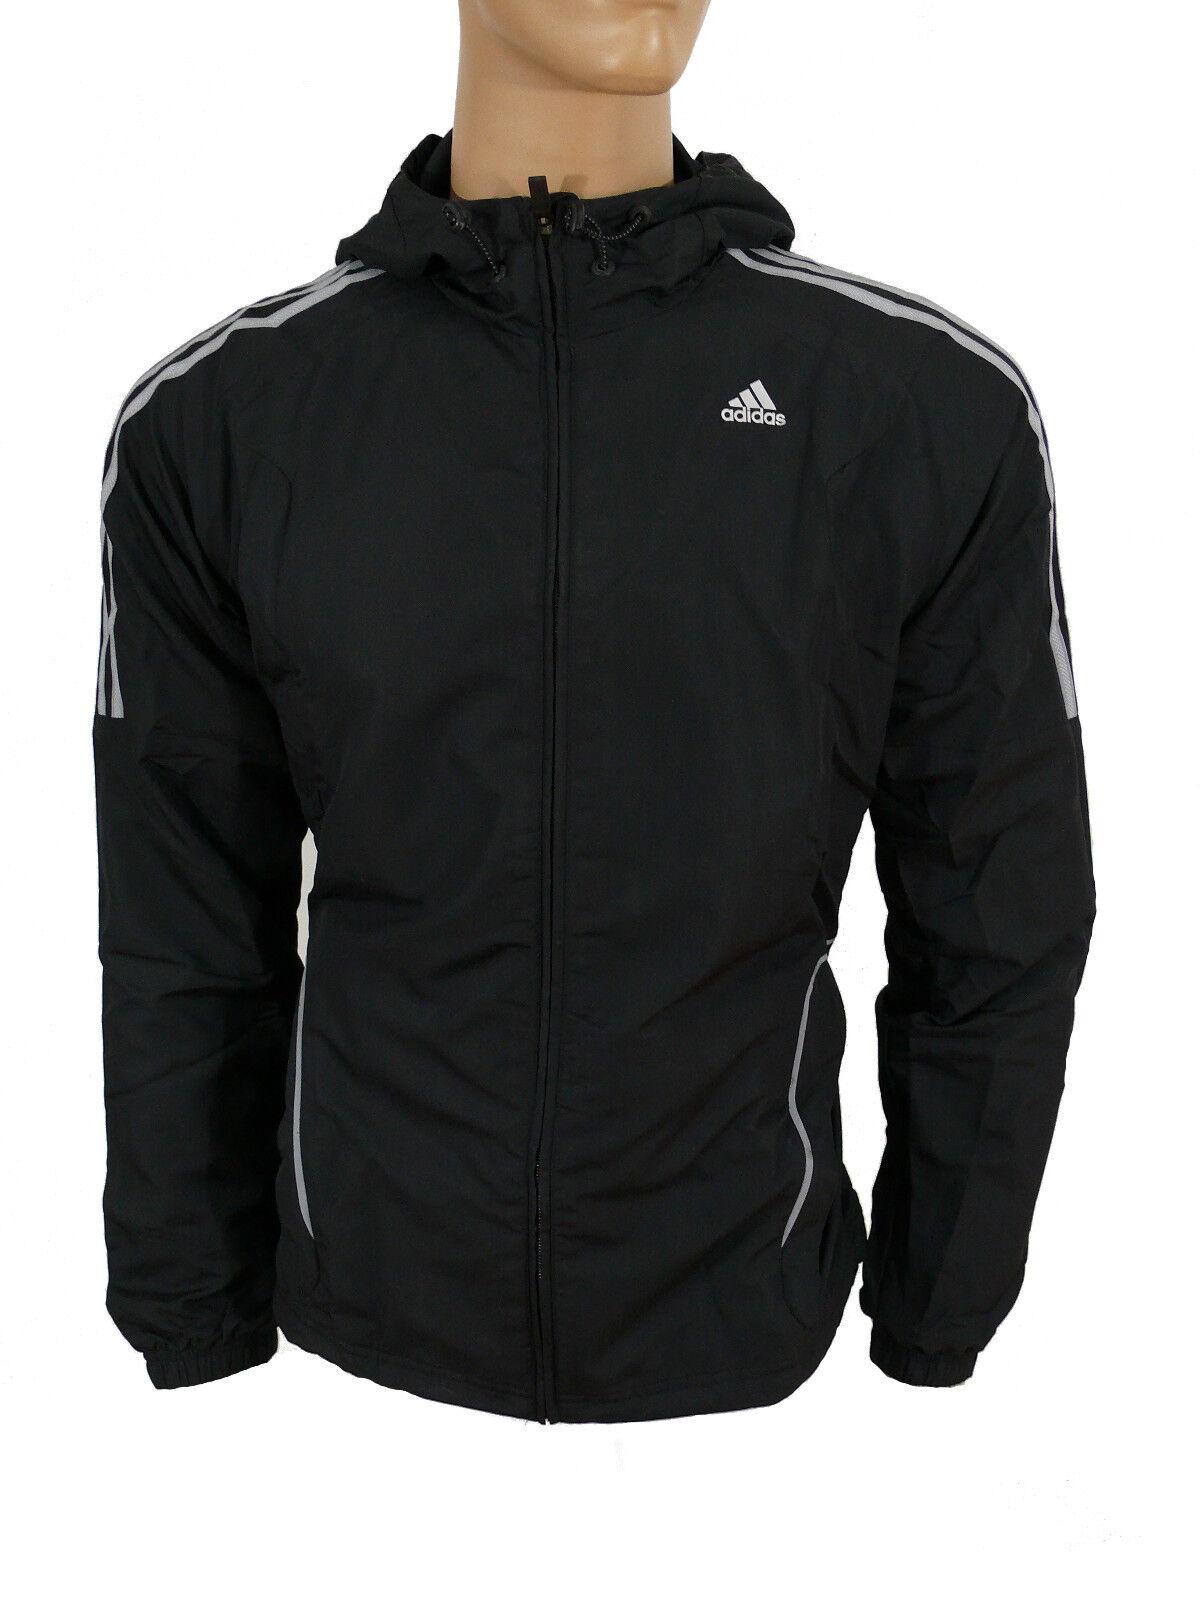 Adidas climaproof chaqueta sweatjacke talla XL